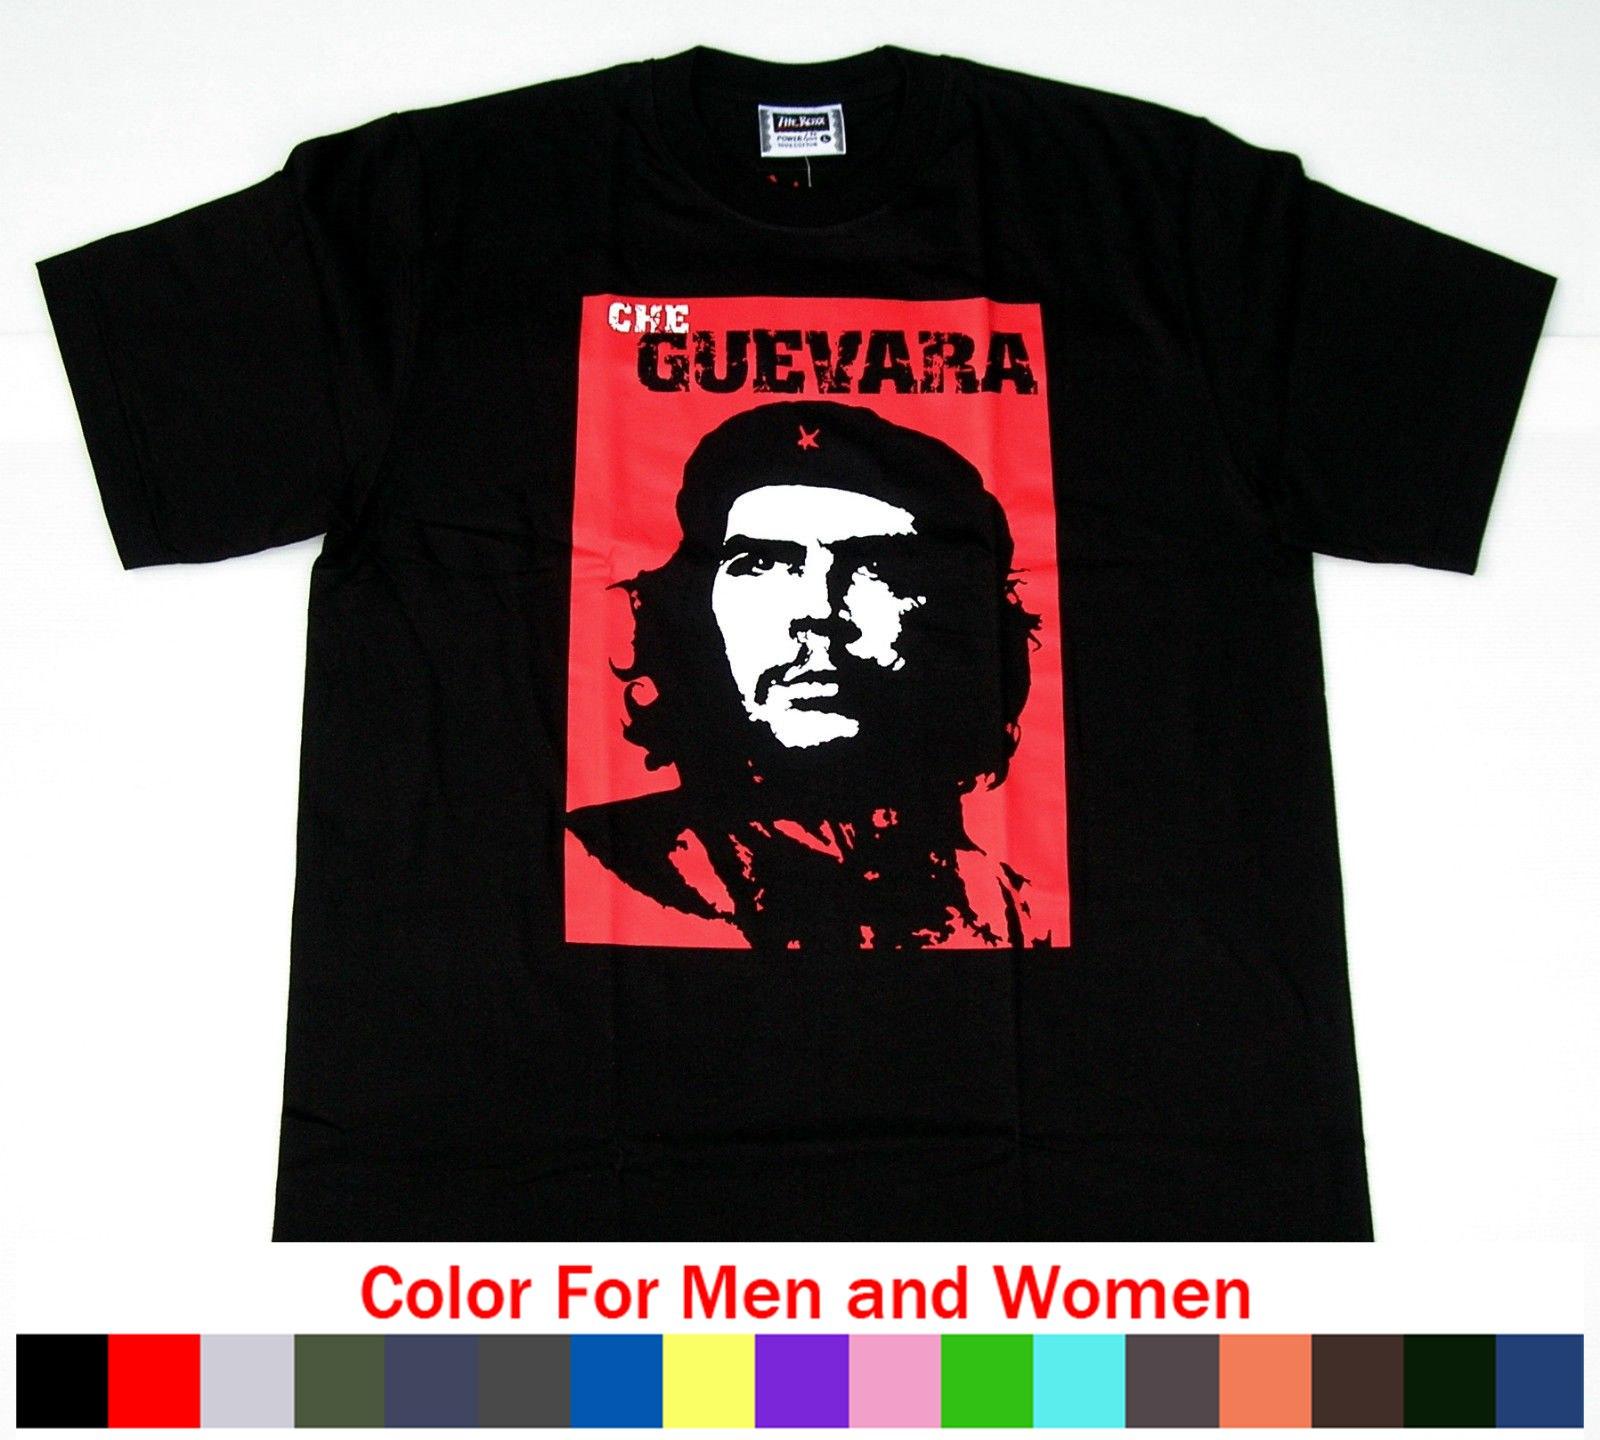 Top Che Guevara camiseta-Gr L-revolución, La revolución-Cuba Liberta 100% de algodón para venta Natural superior Tee camisas